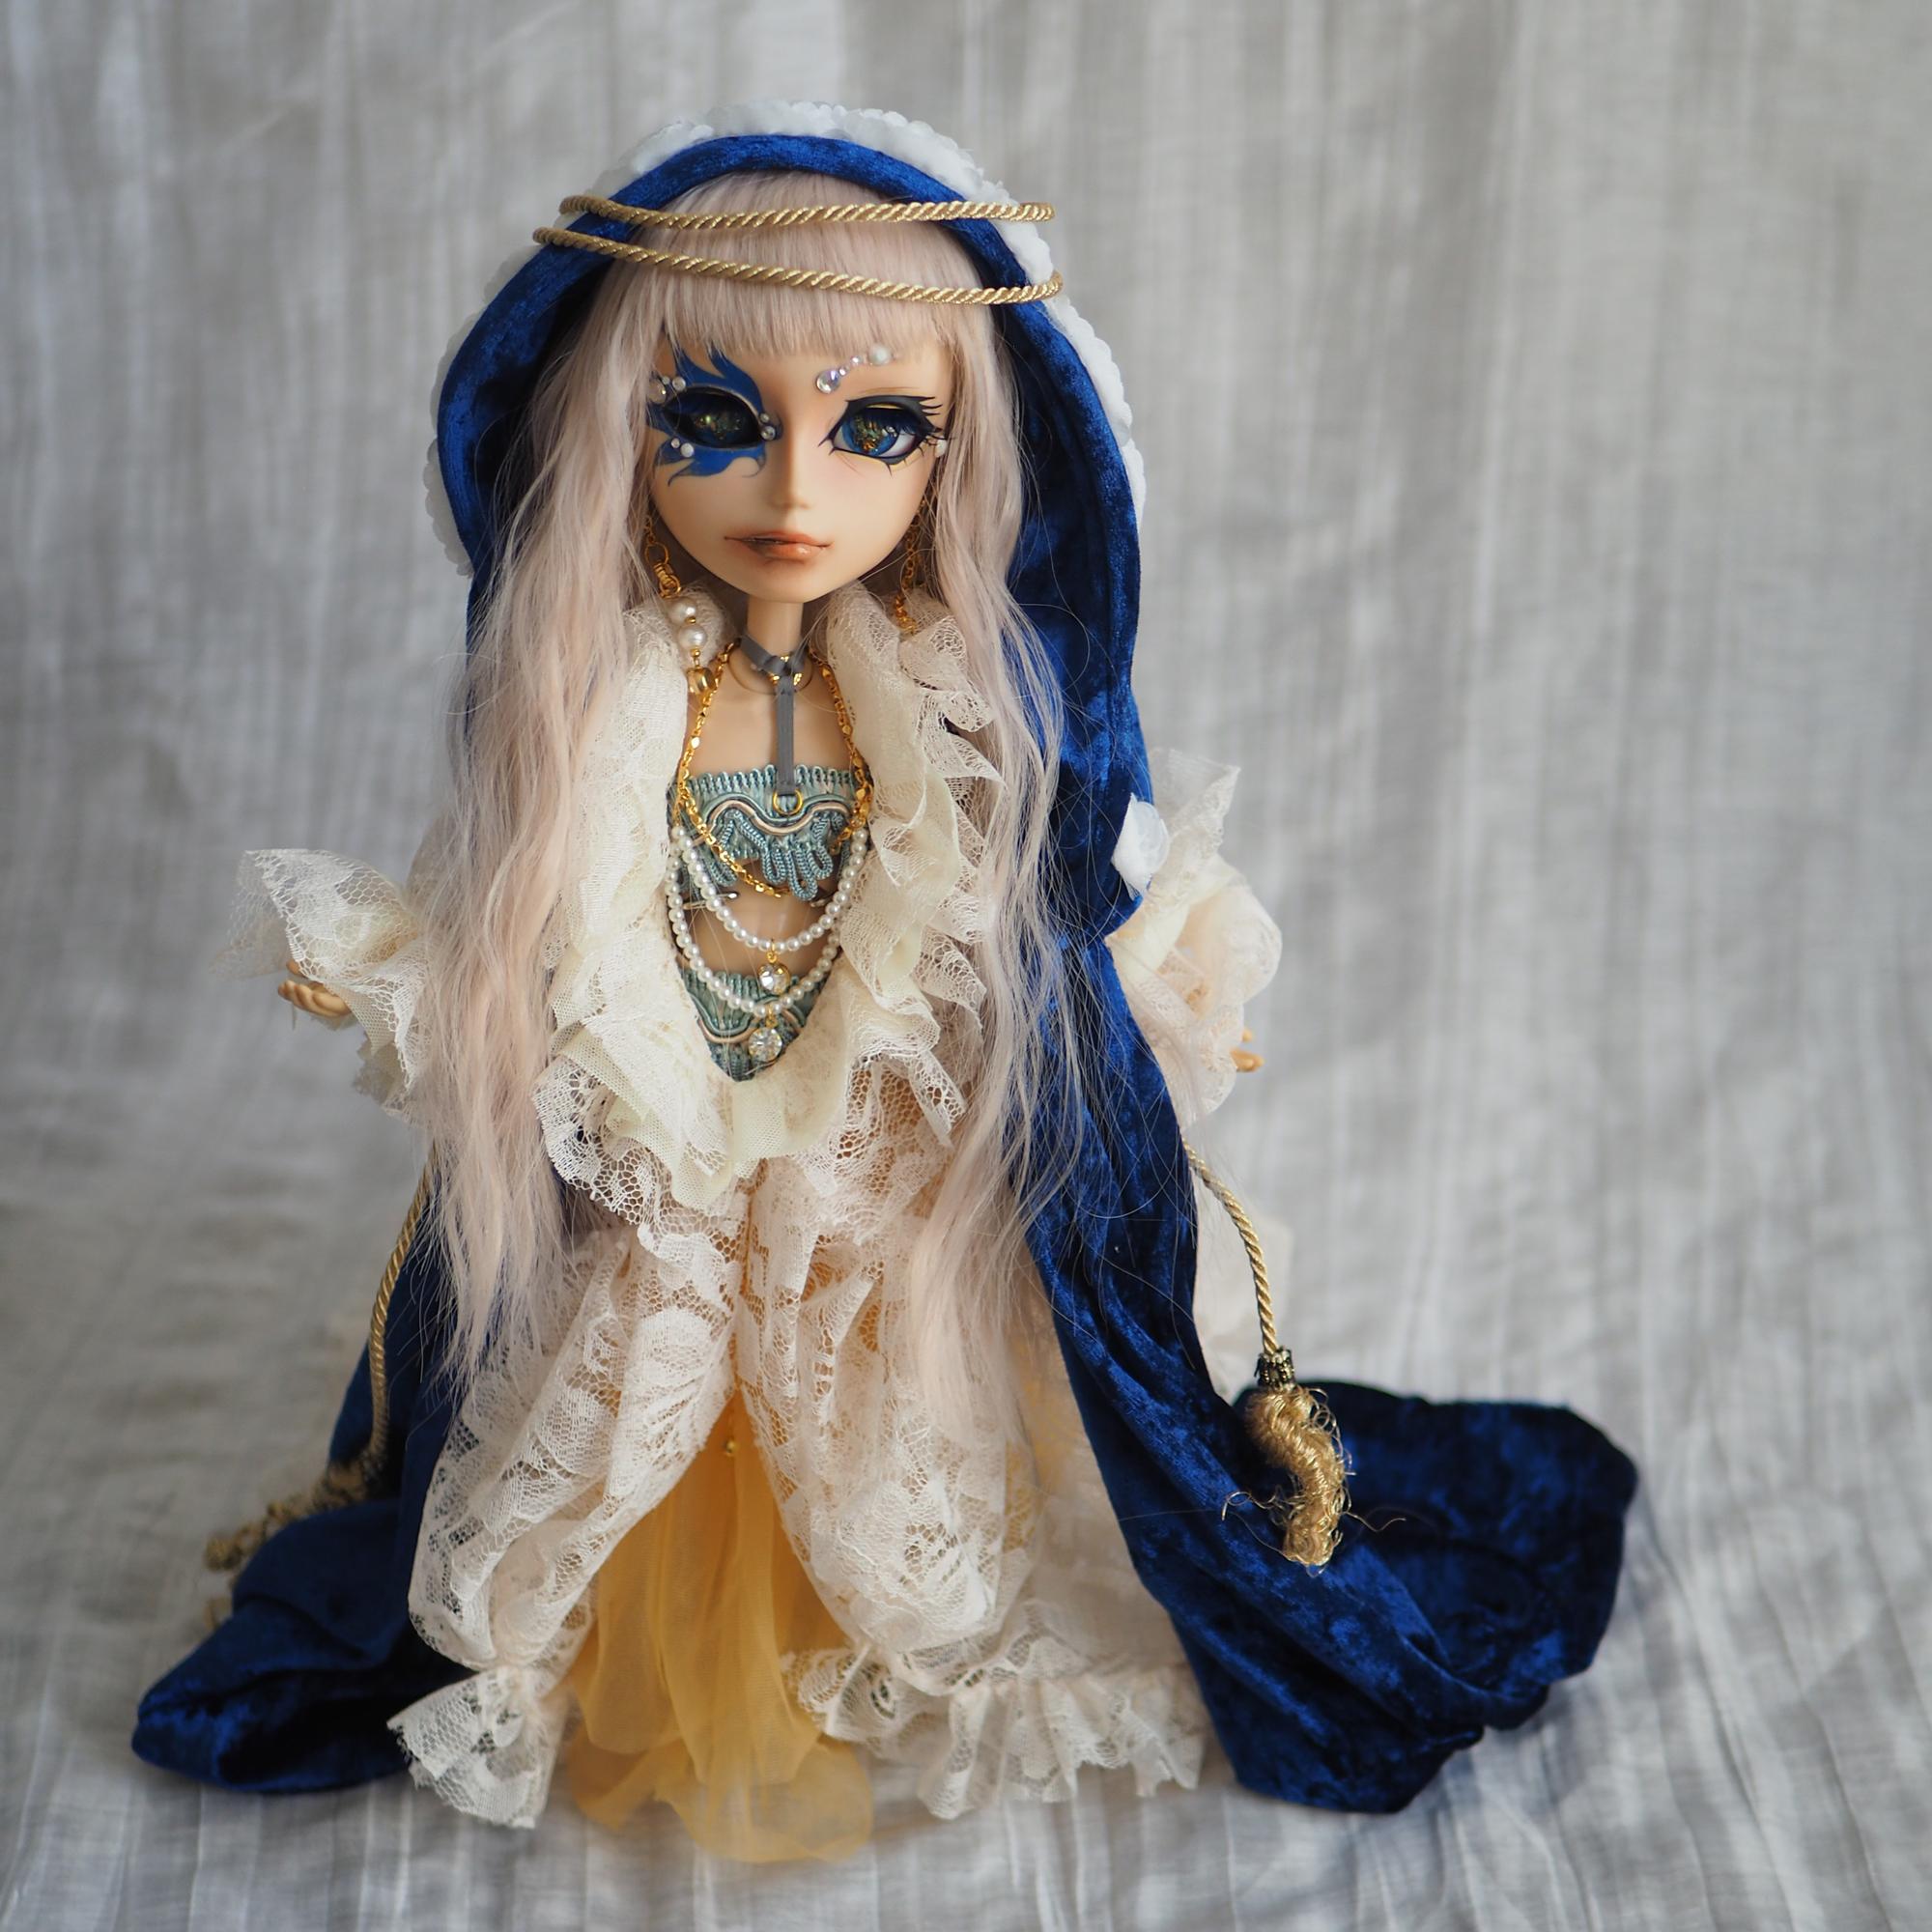 Madonna blue(マドンナブルー)全身正面